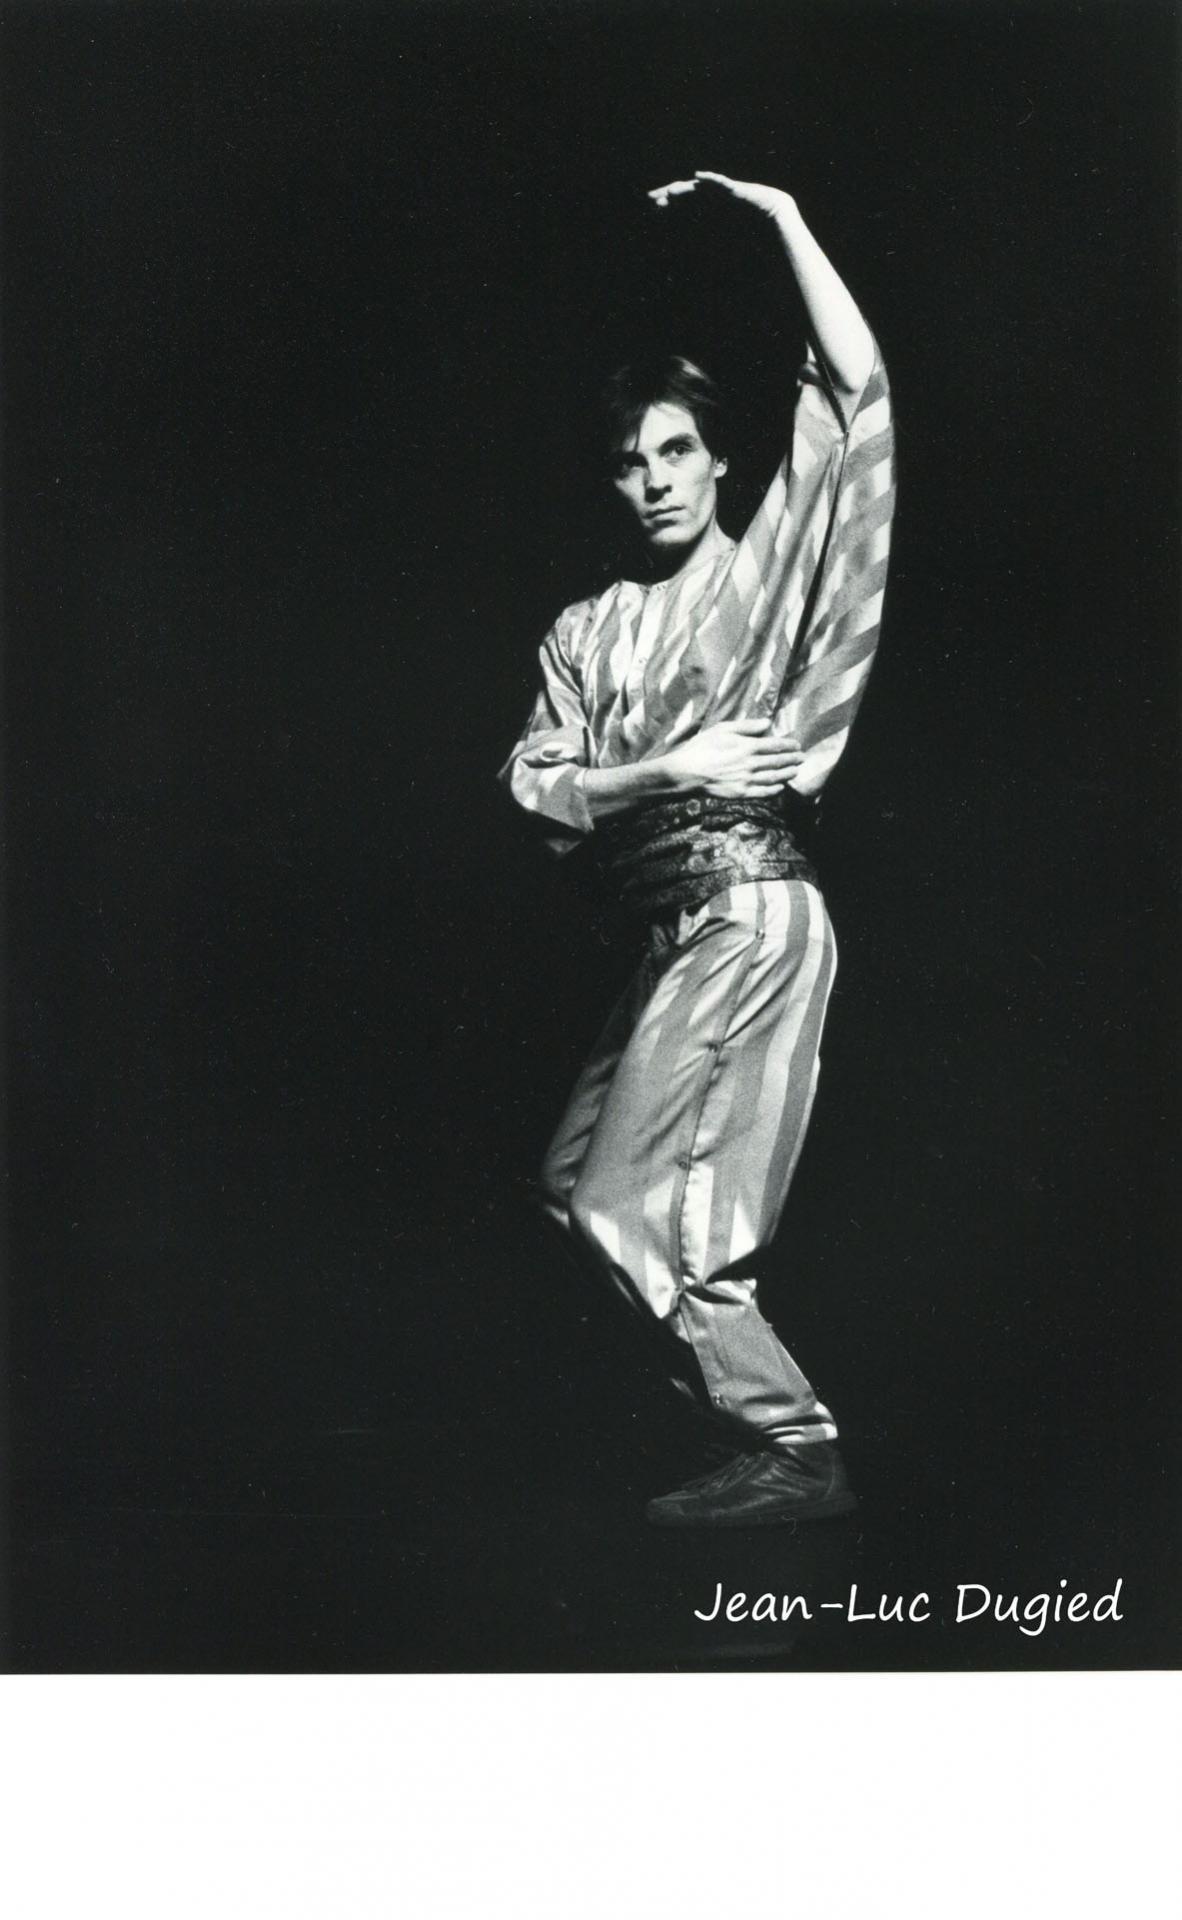 19 Dugied Fabrice - les zonards célestes - Bernard Collin - 1987